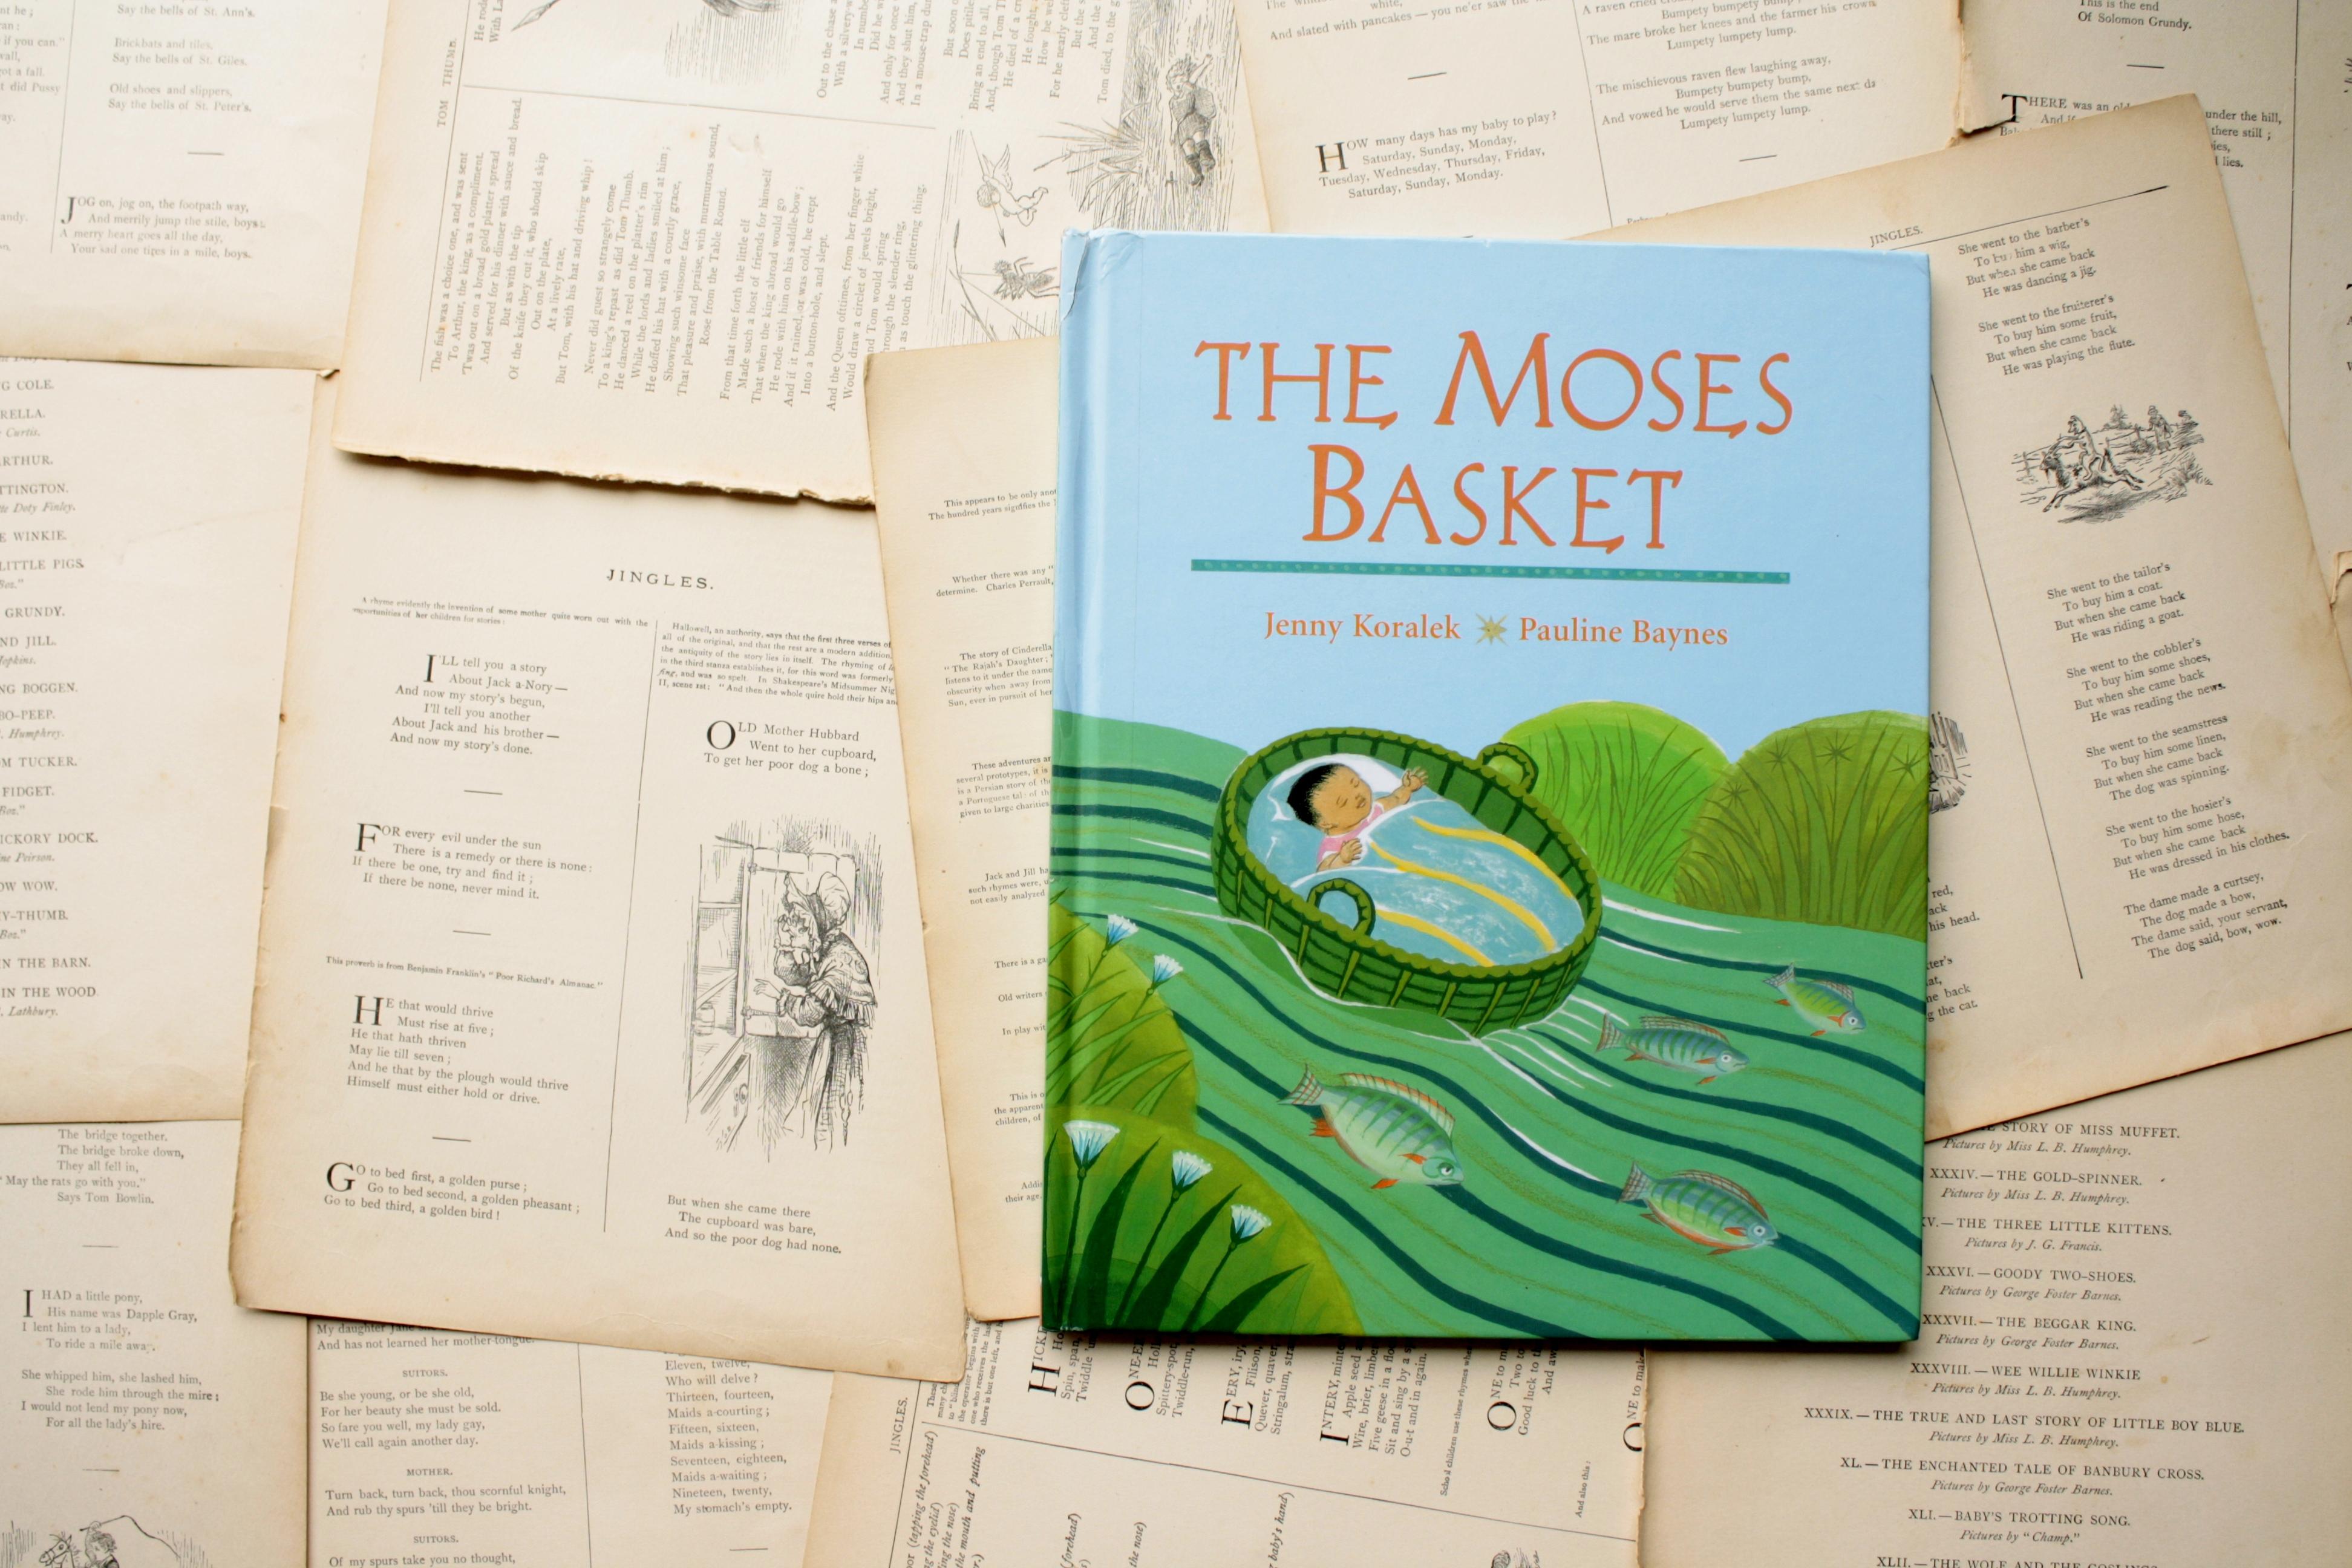 The Moses Basket | Jenny Koralek